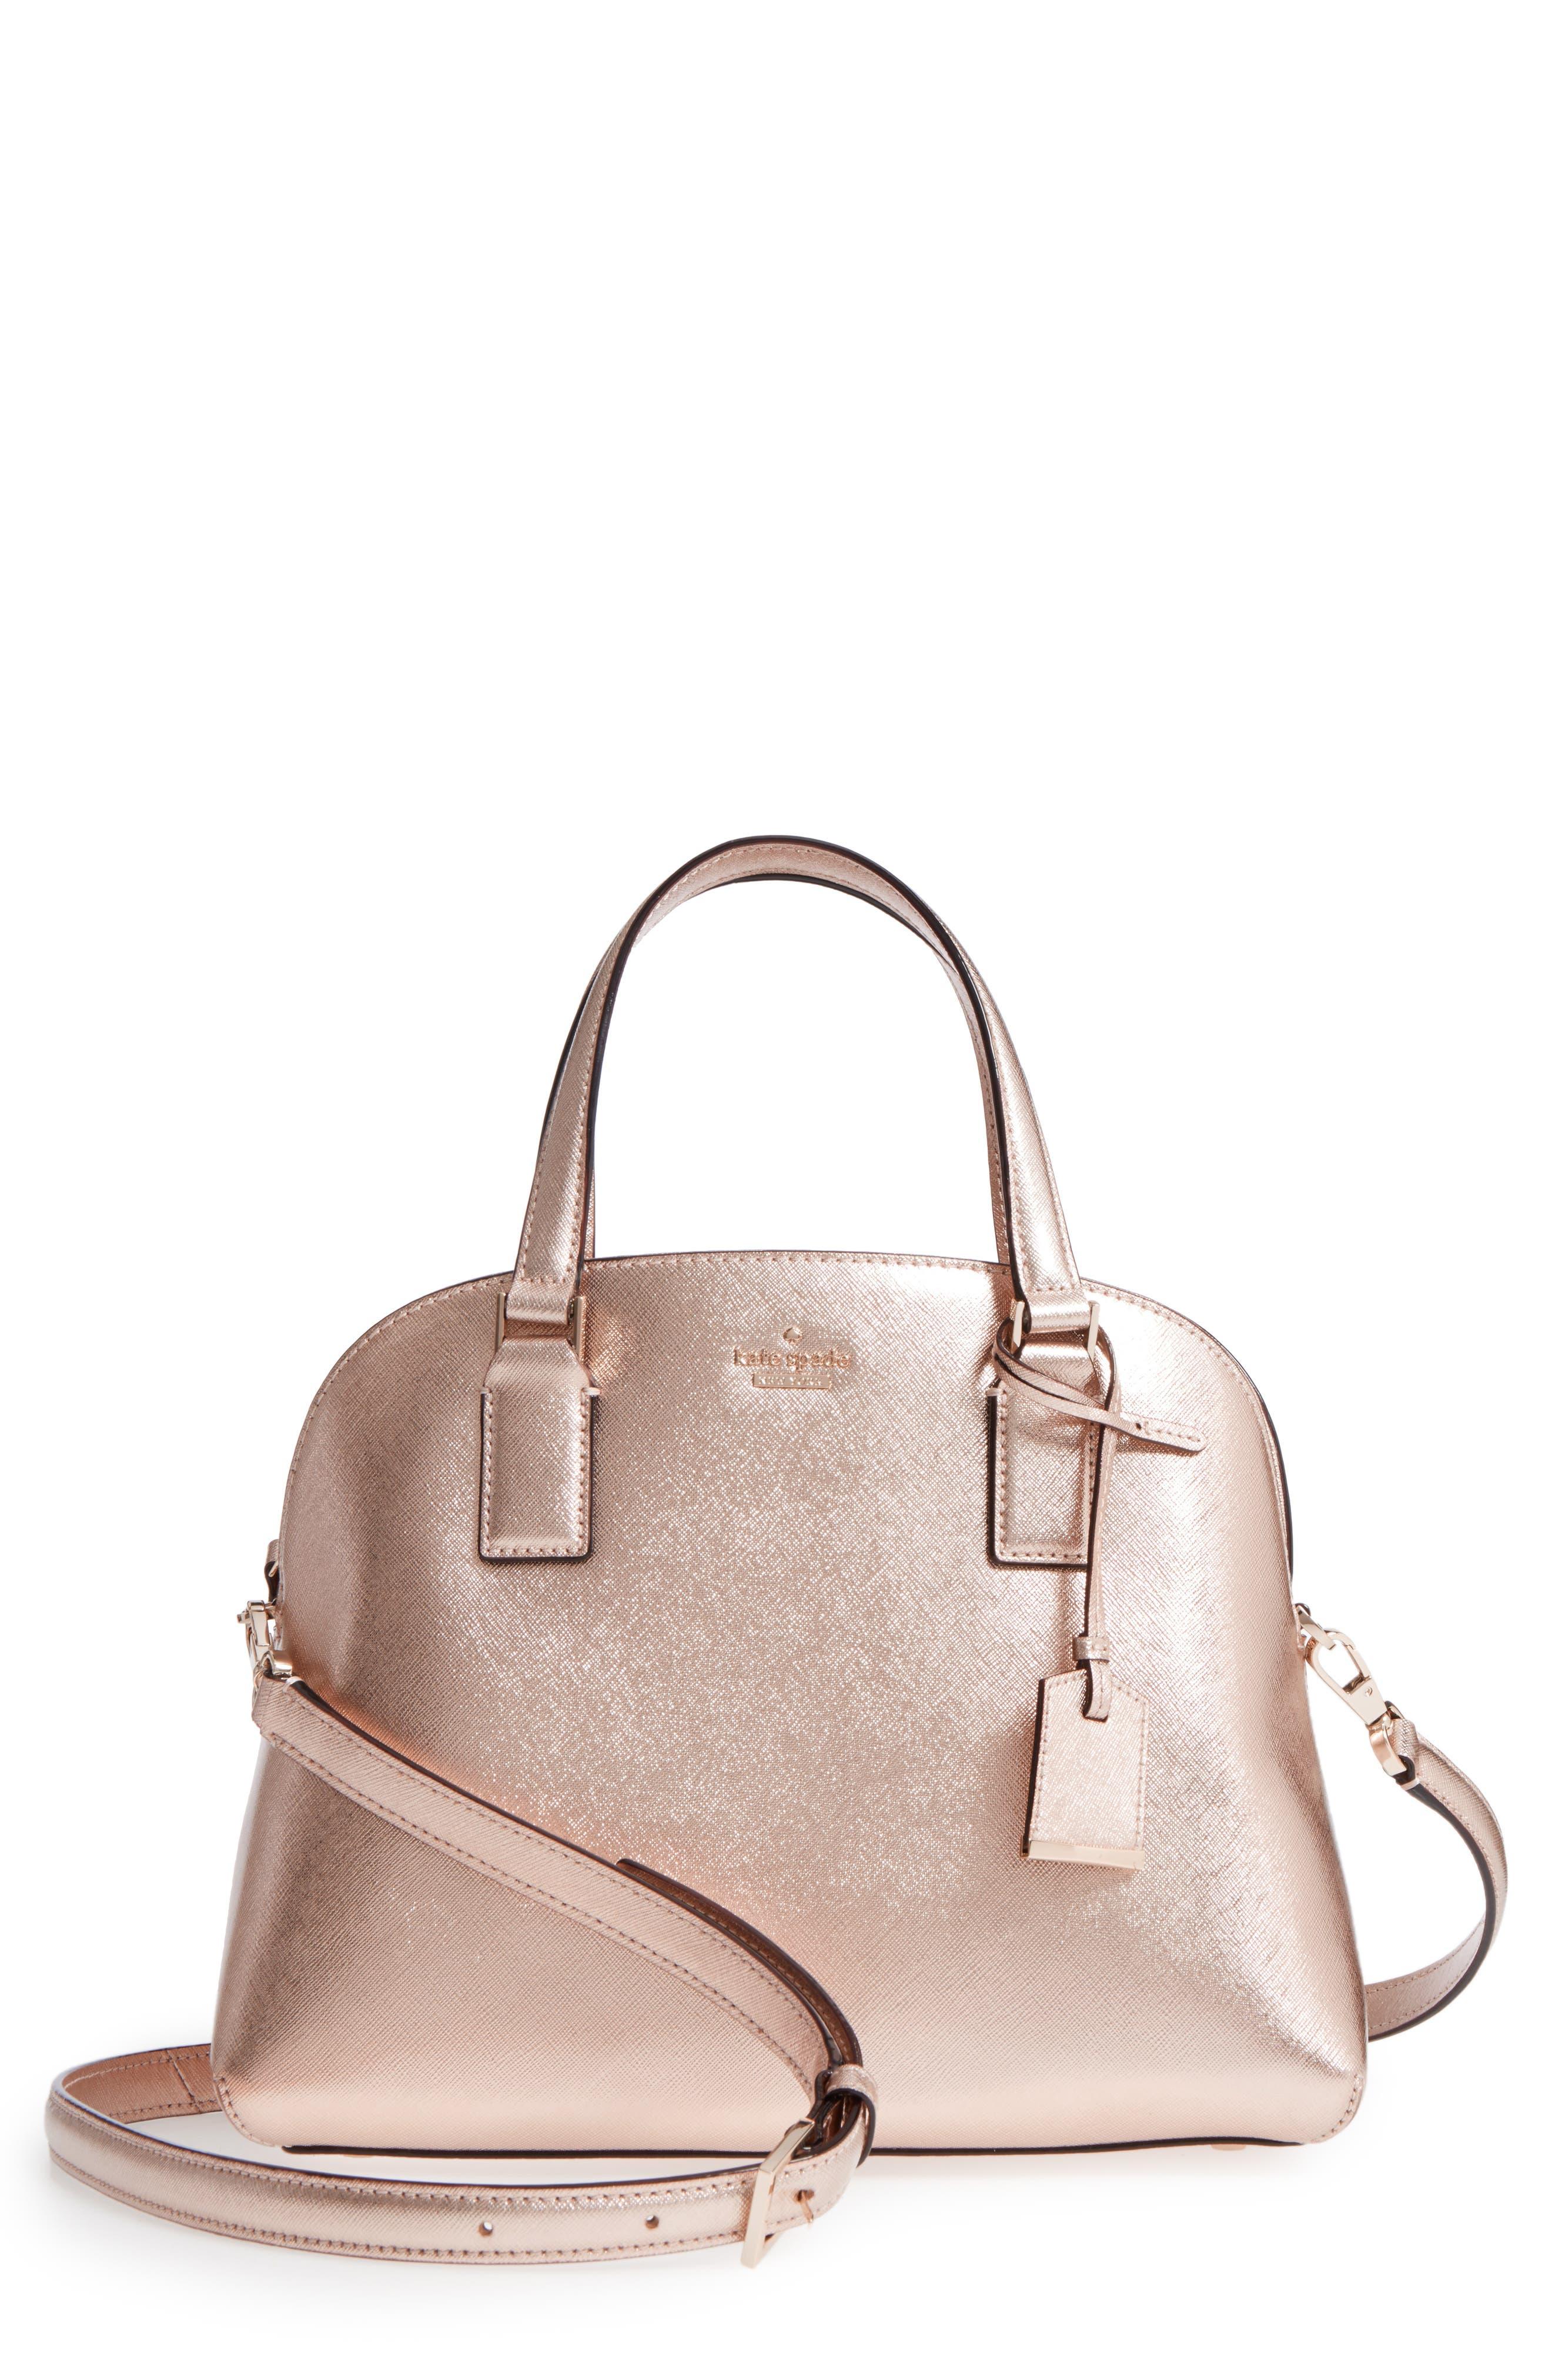 Main Image - kate spade new york cameron street - lottie leather satchel